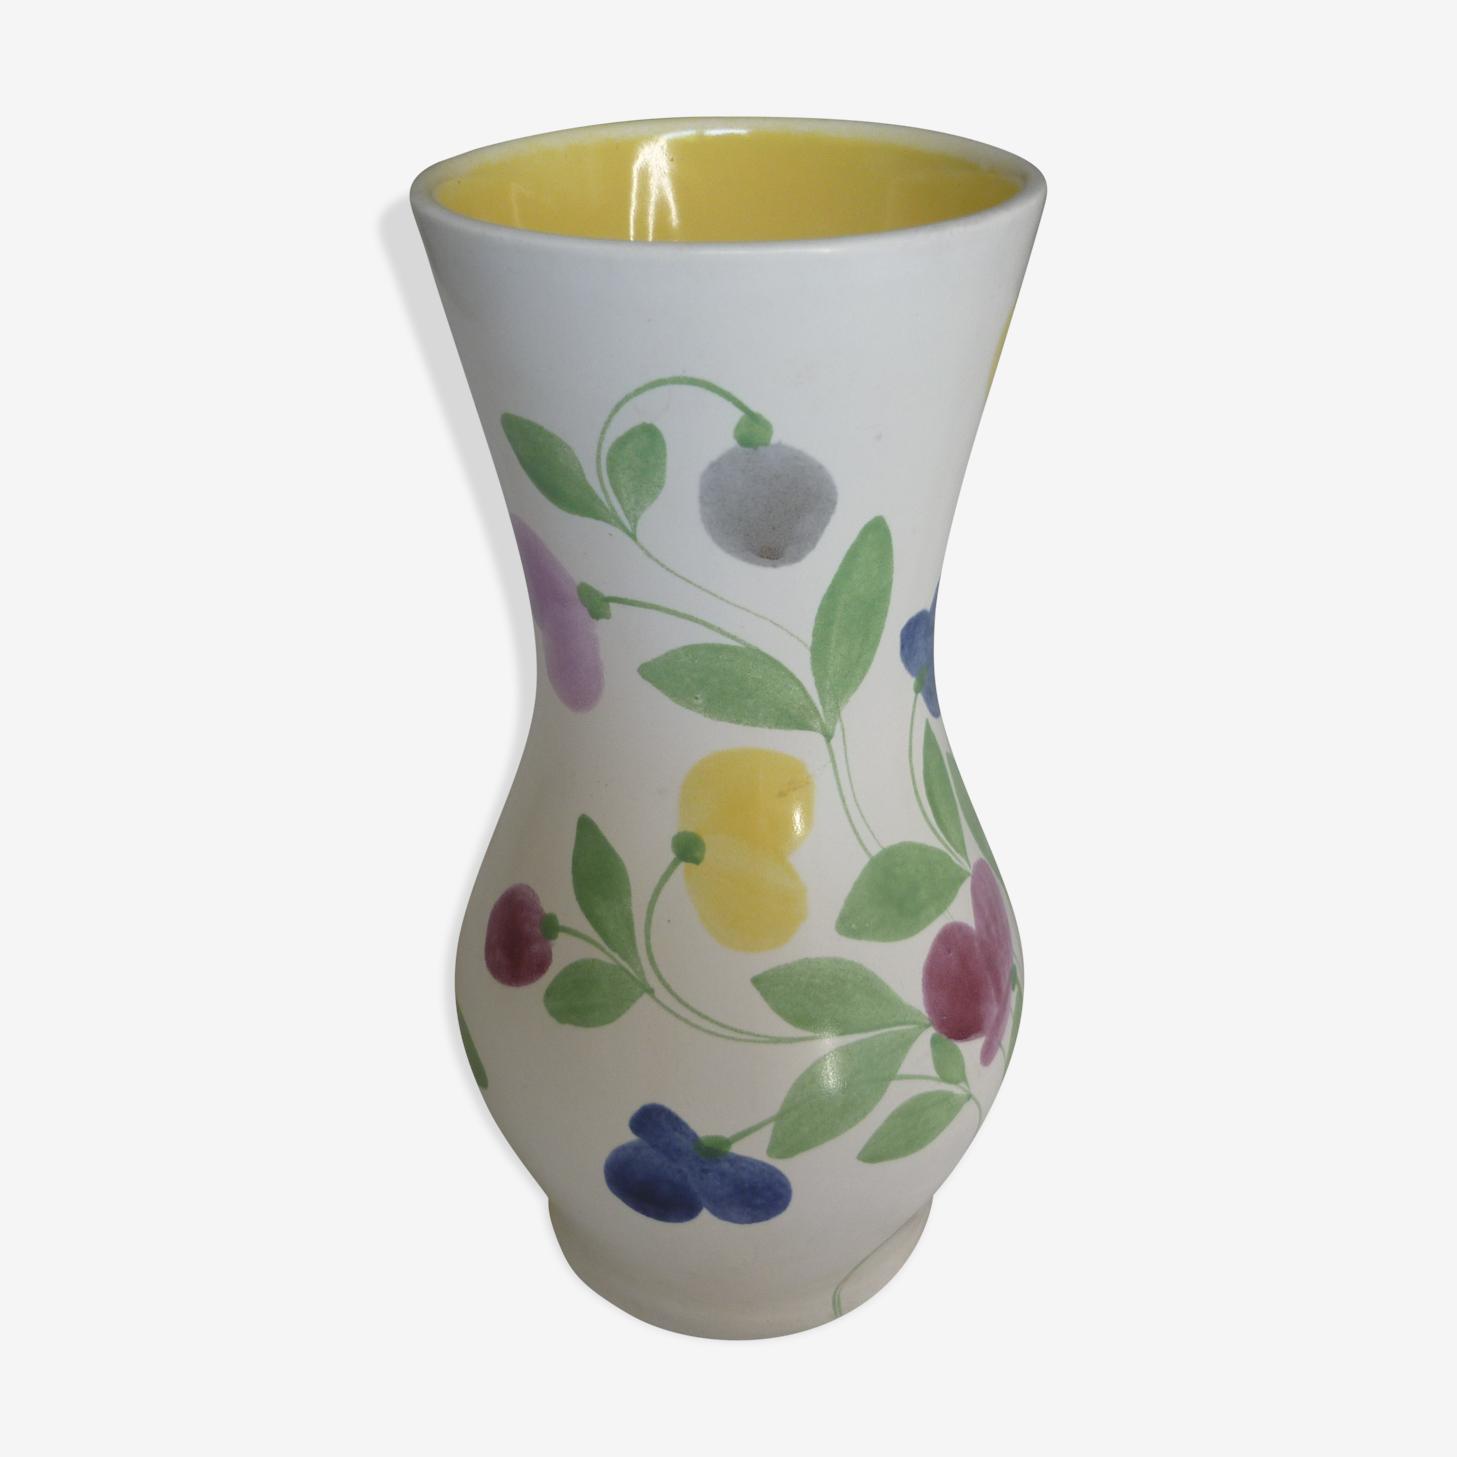 Vase vintage earthenware of St Clement decor flowers